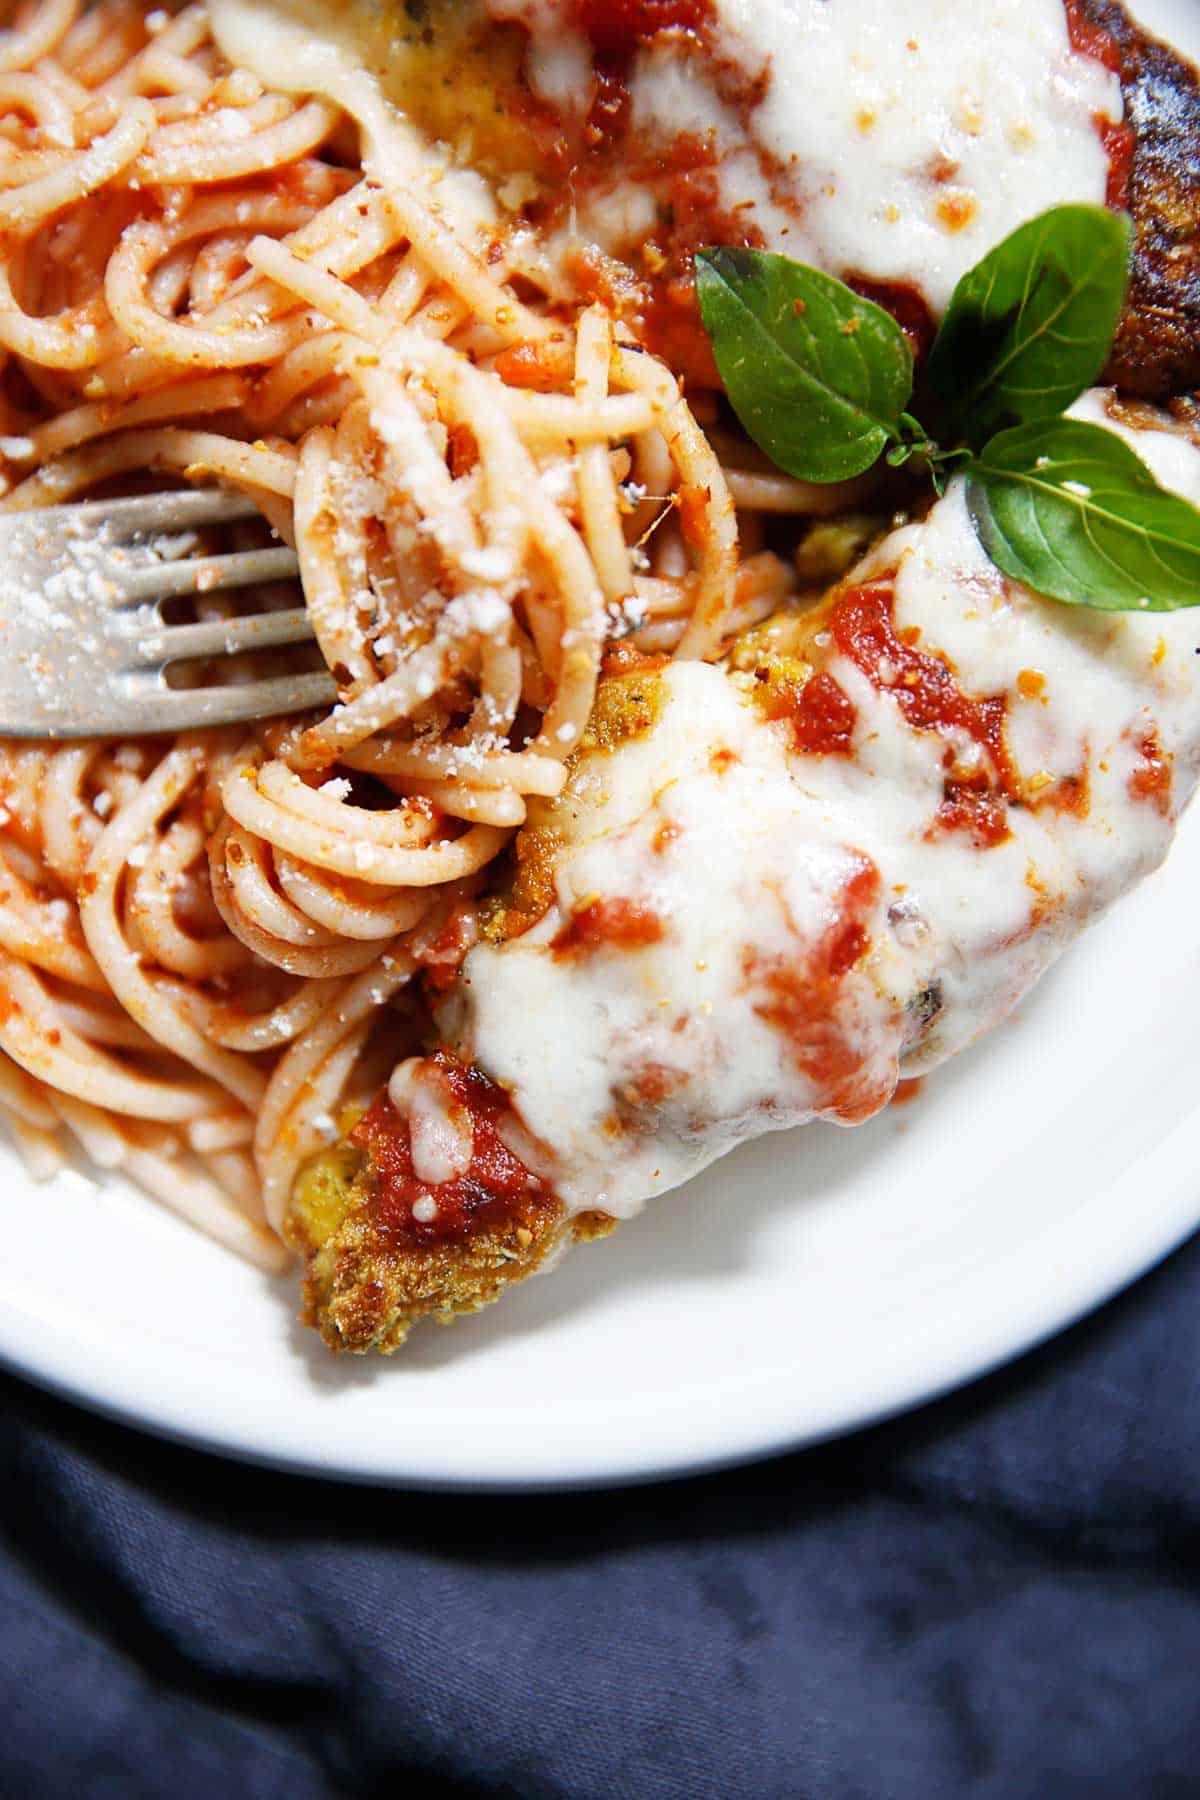 Low Carb Chicken Parmesan (keto, paleo) - Lexi's Clean Kitchen